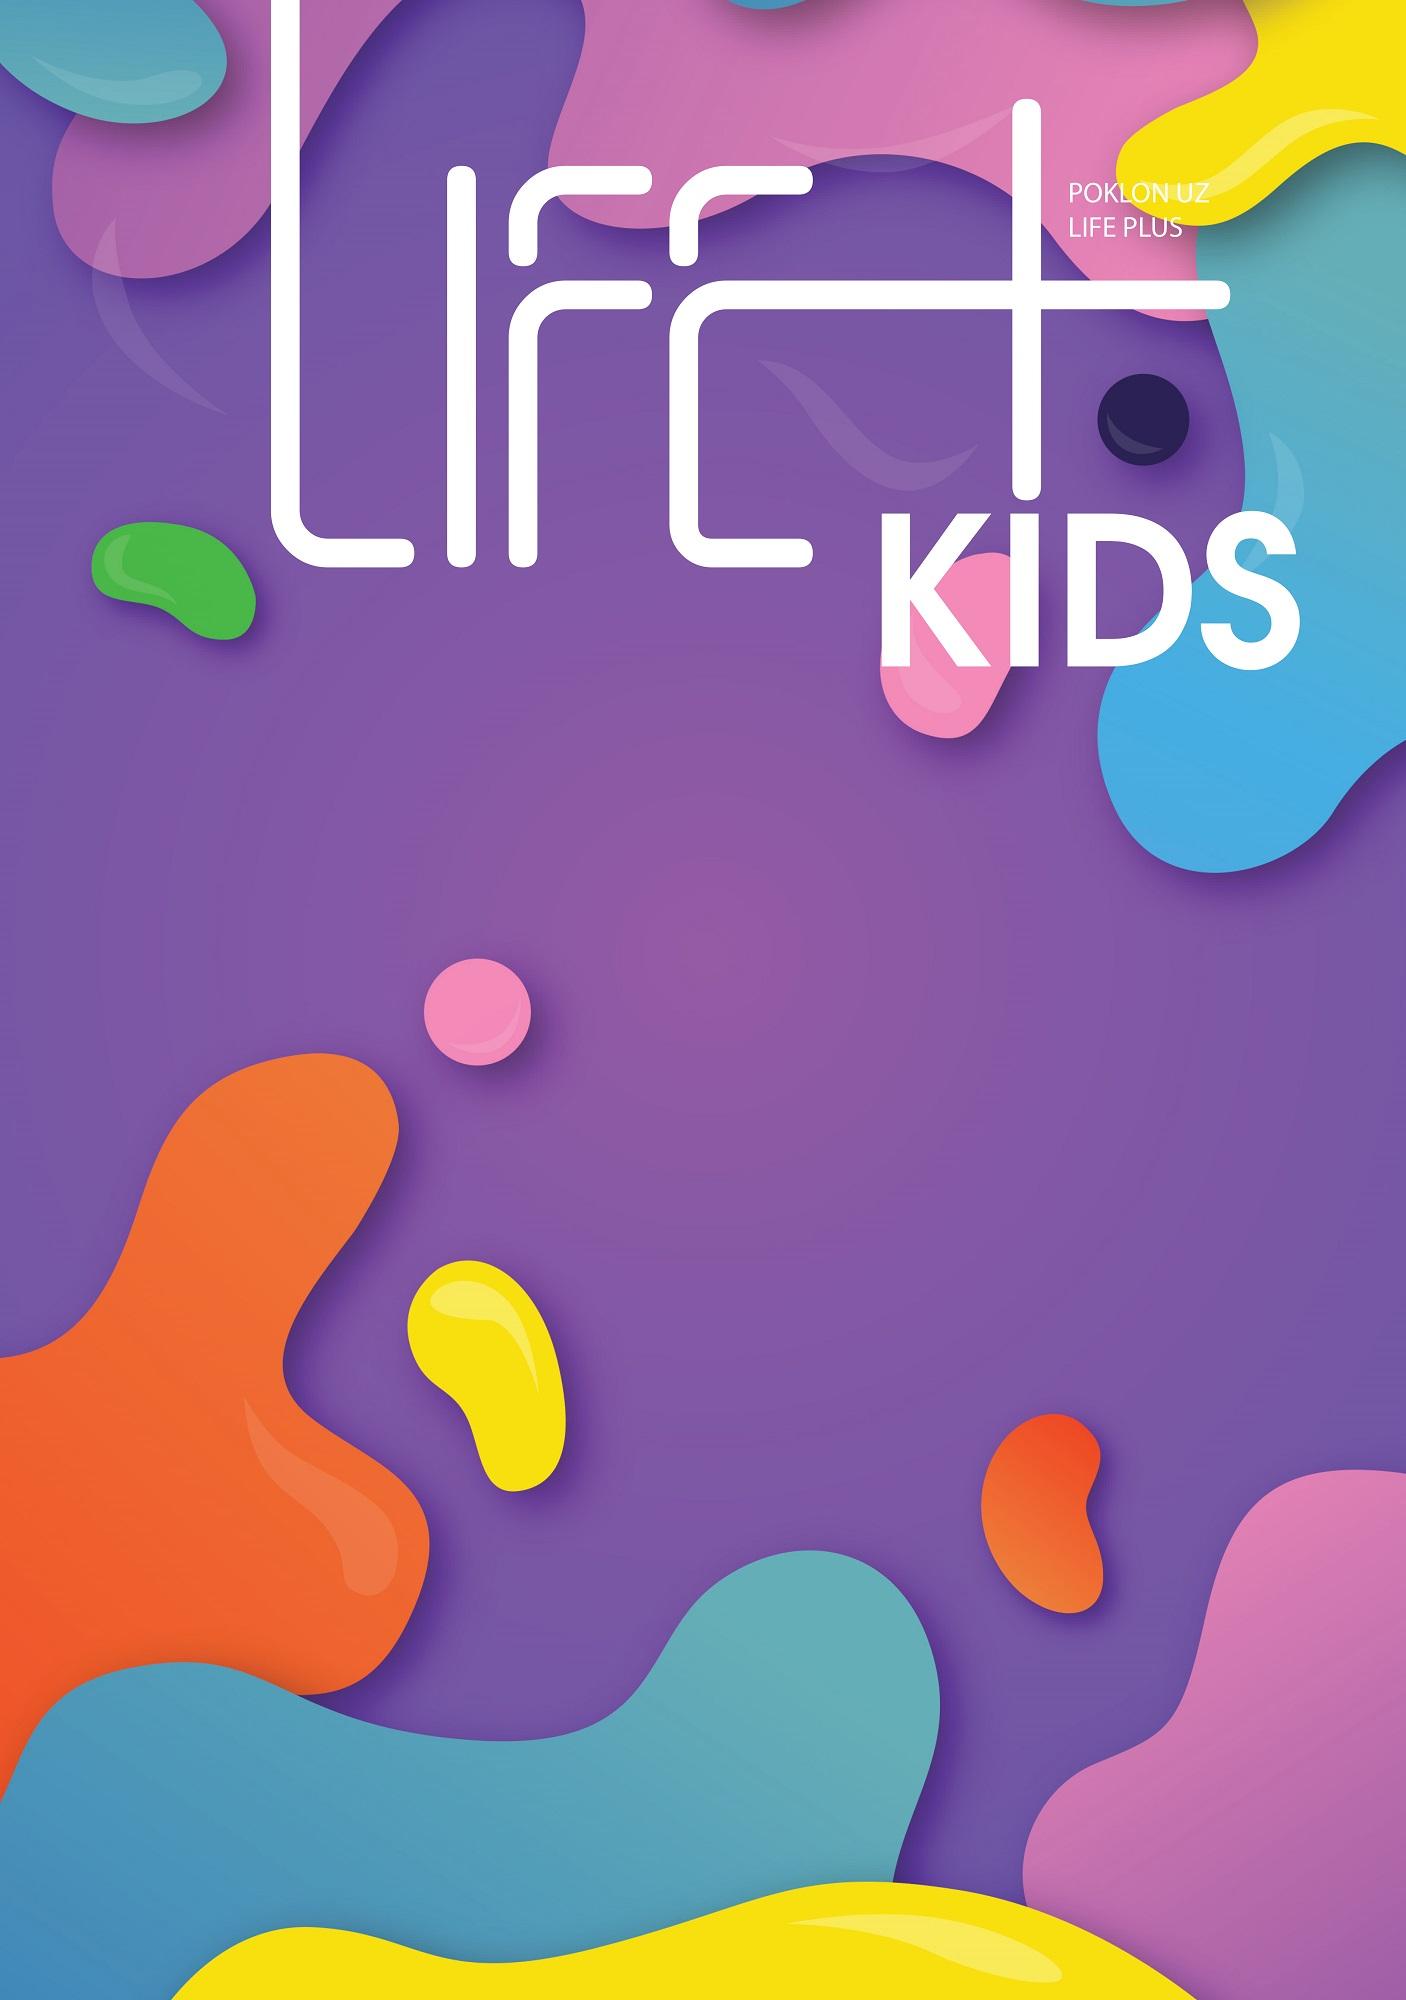 LIFE+ KIDS